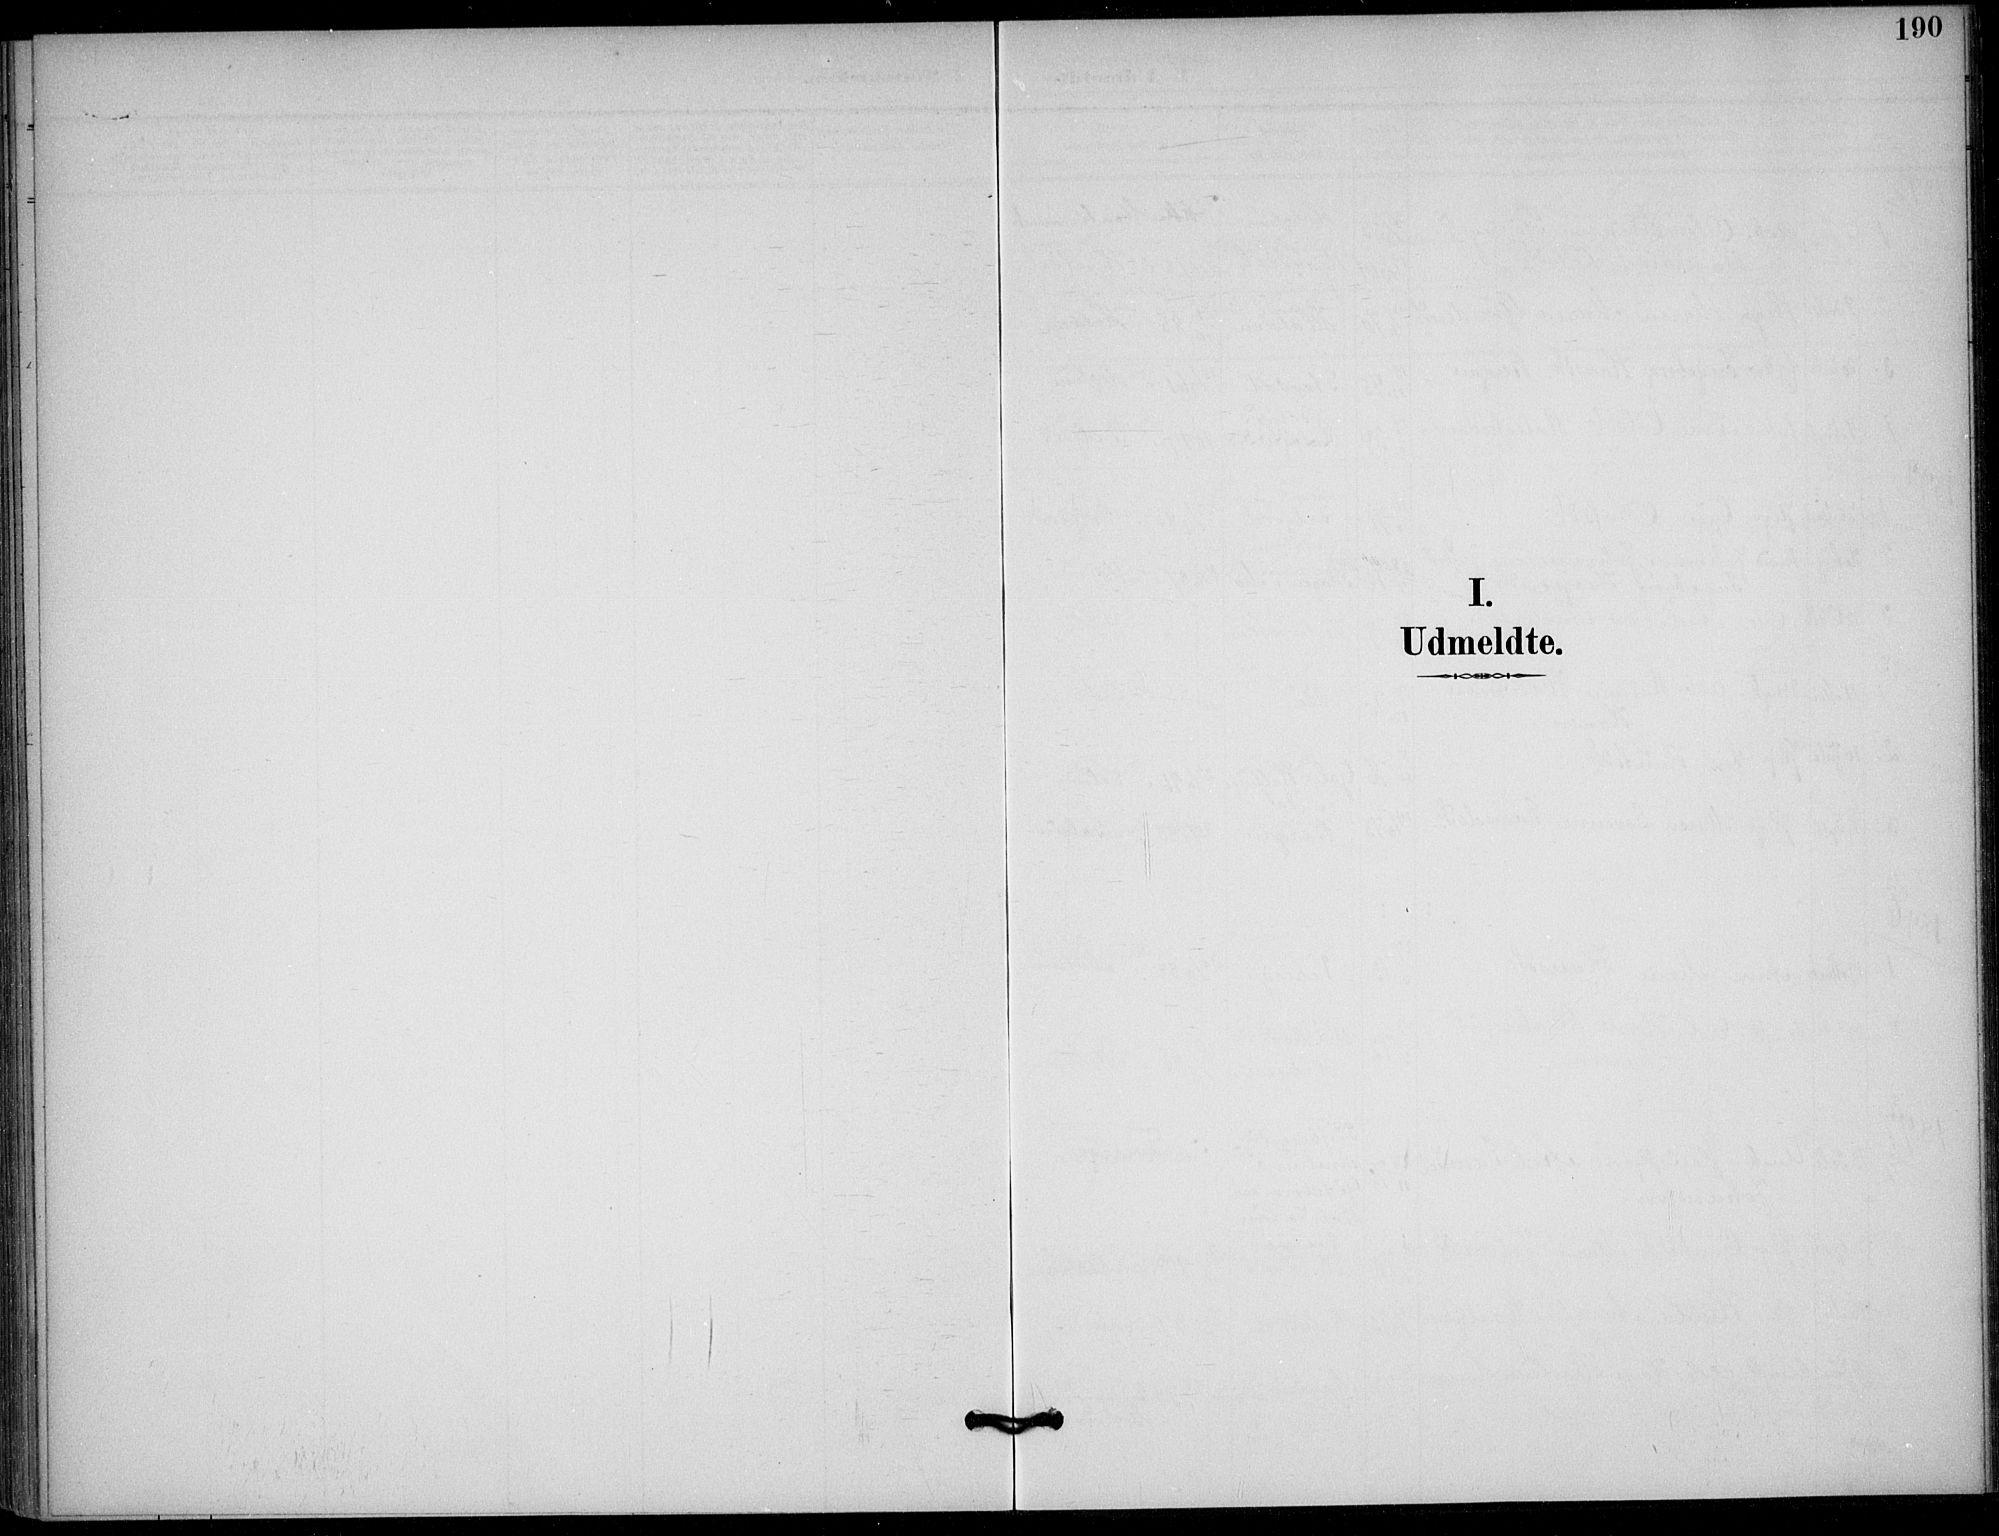 SAKO, Solum kirkebøker, F/Fb/L0002: Ministerialbok nr. II 2, 1893-1901, s. 190